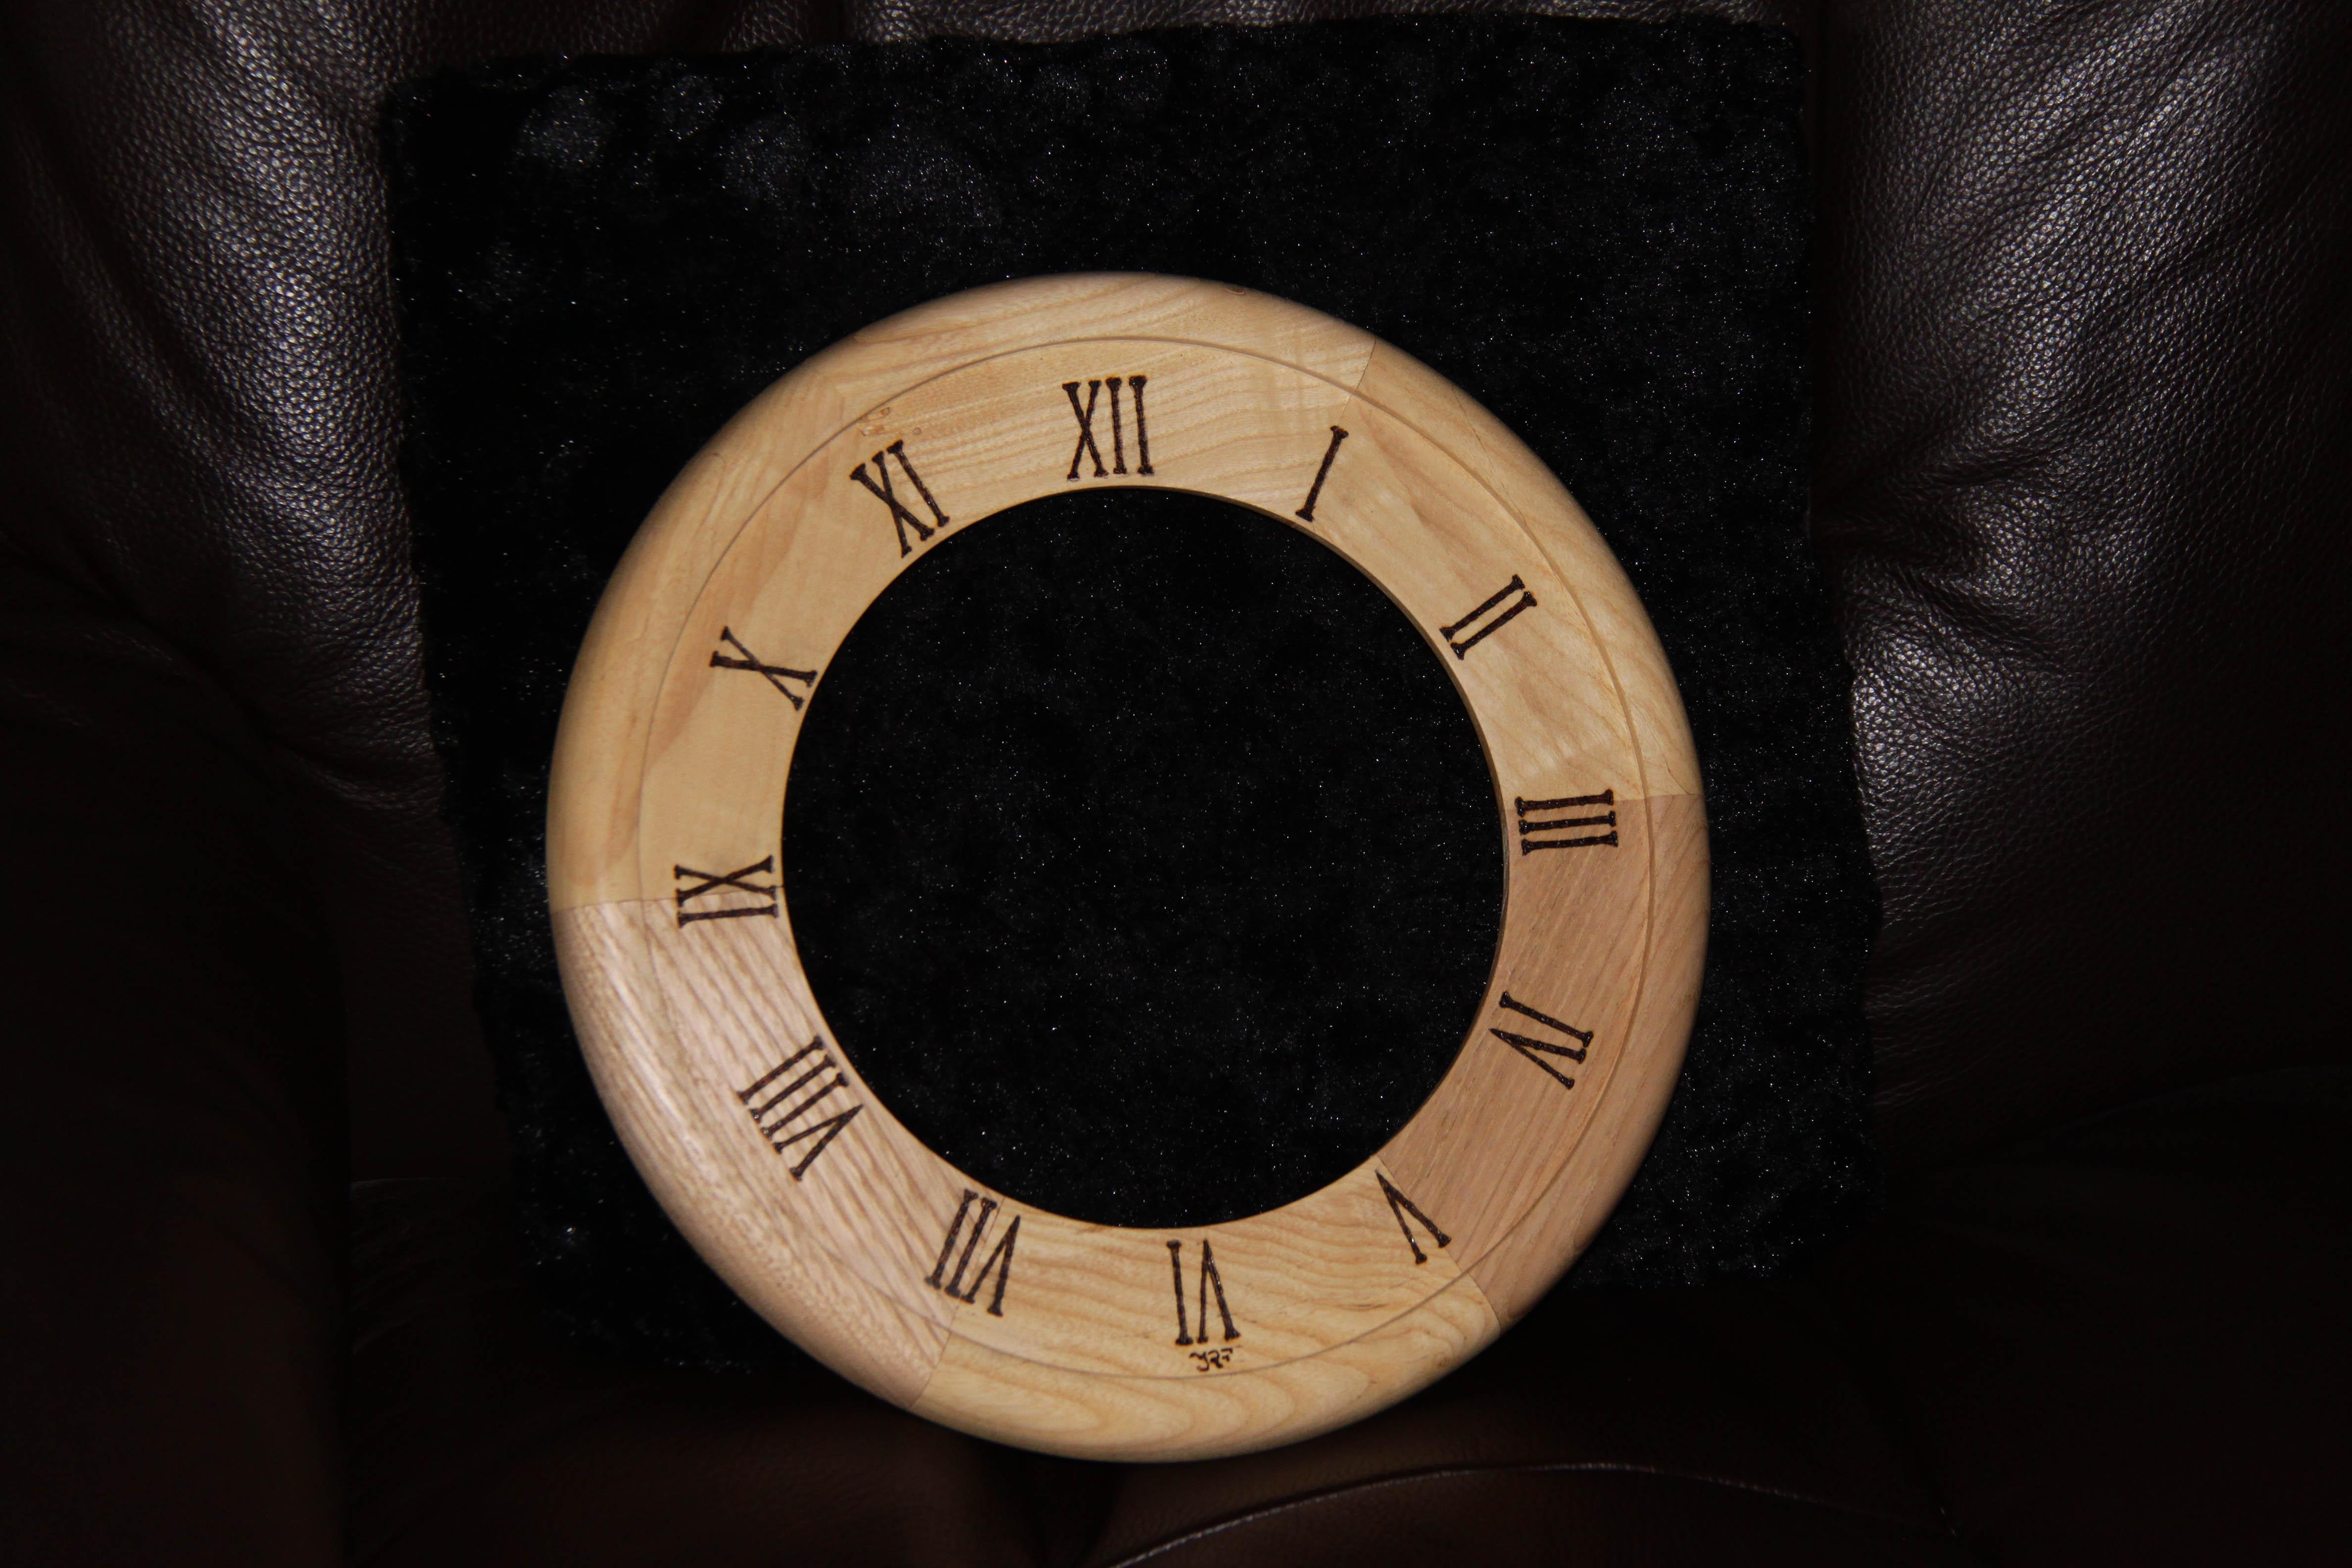 c clock face 2.jpg